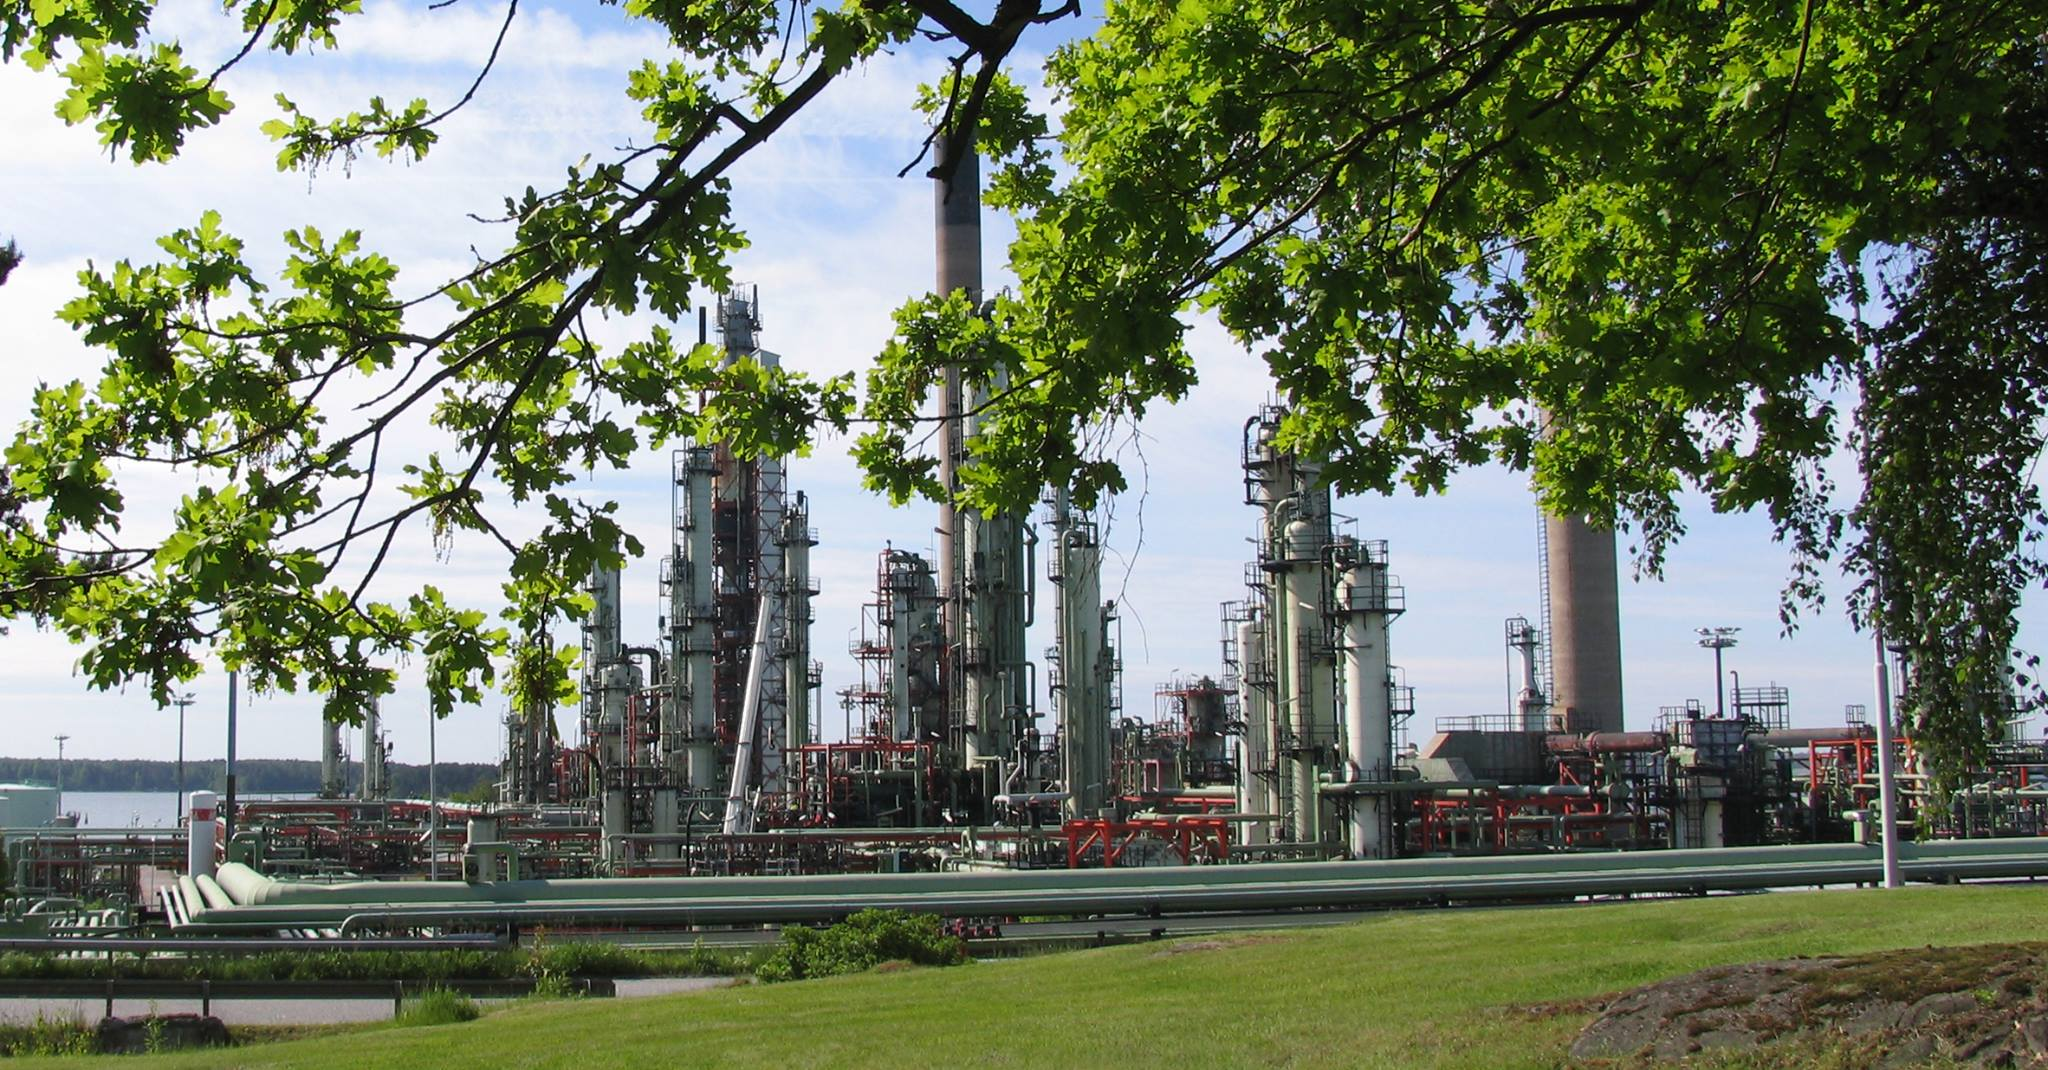 Naantali refinery